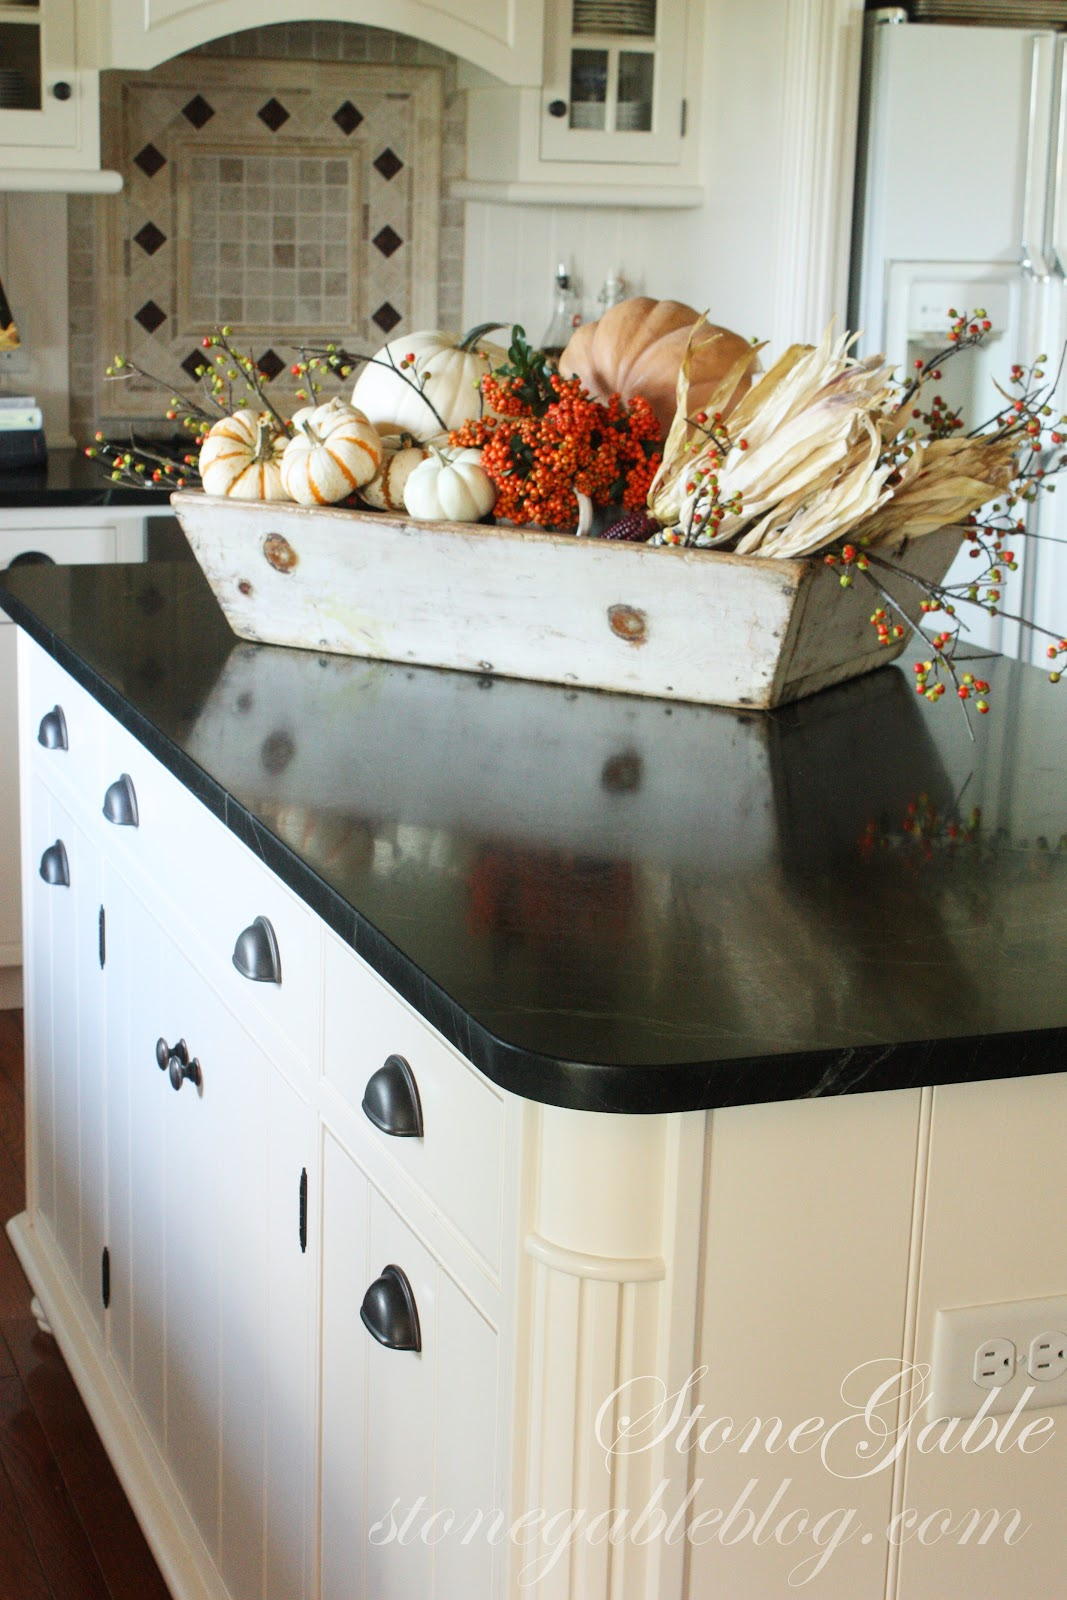 Fall splendor stonegable - How to decorate a kitchen island ...